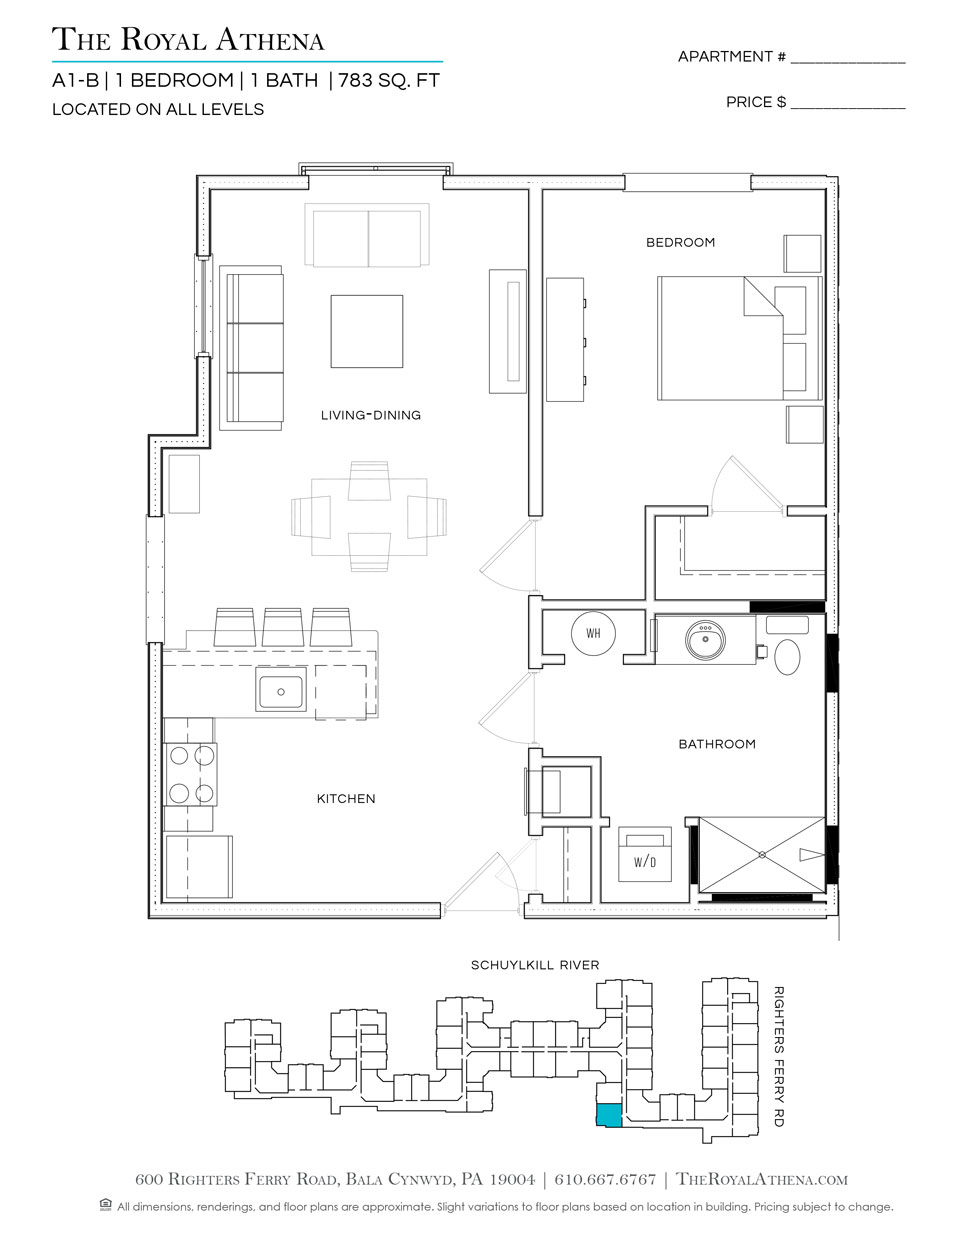 P0659218 a1 b 2 floorplan